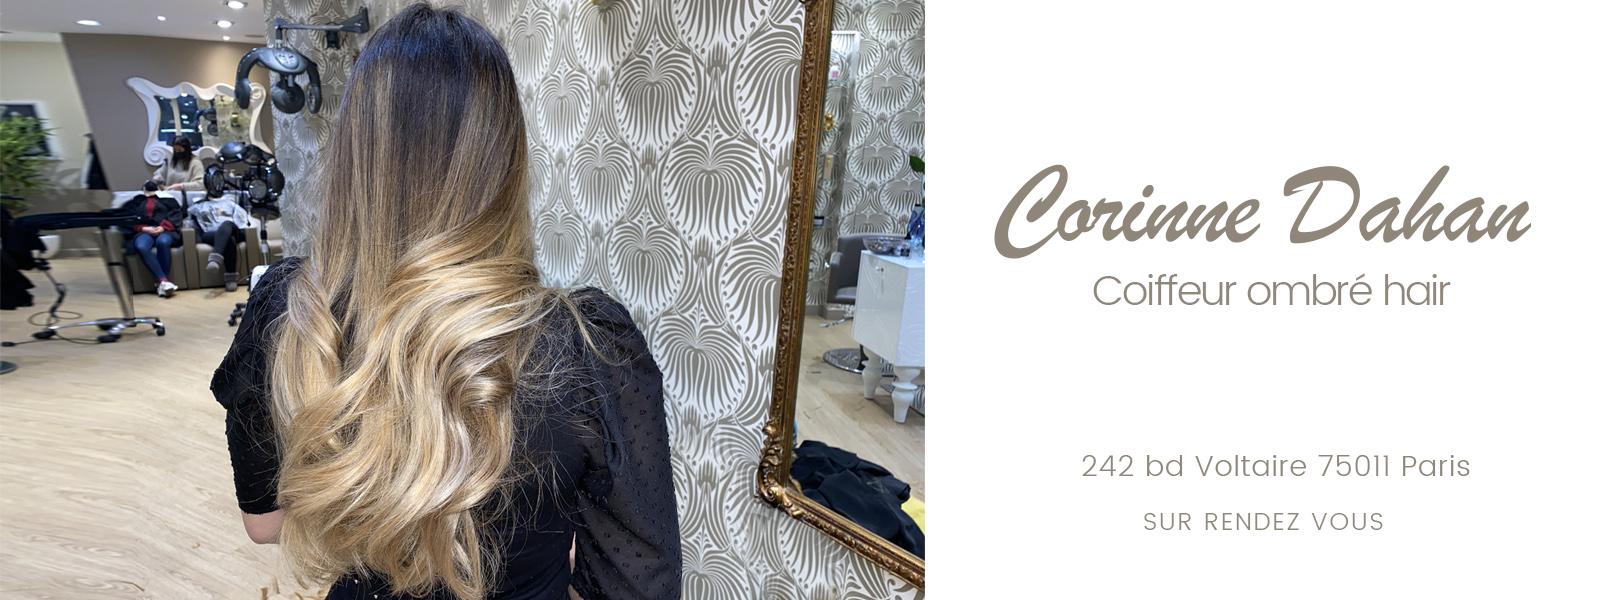 Salon de coiffure Paris 11